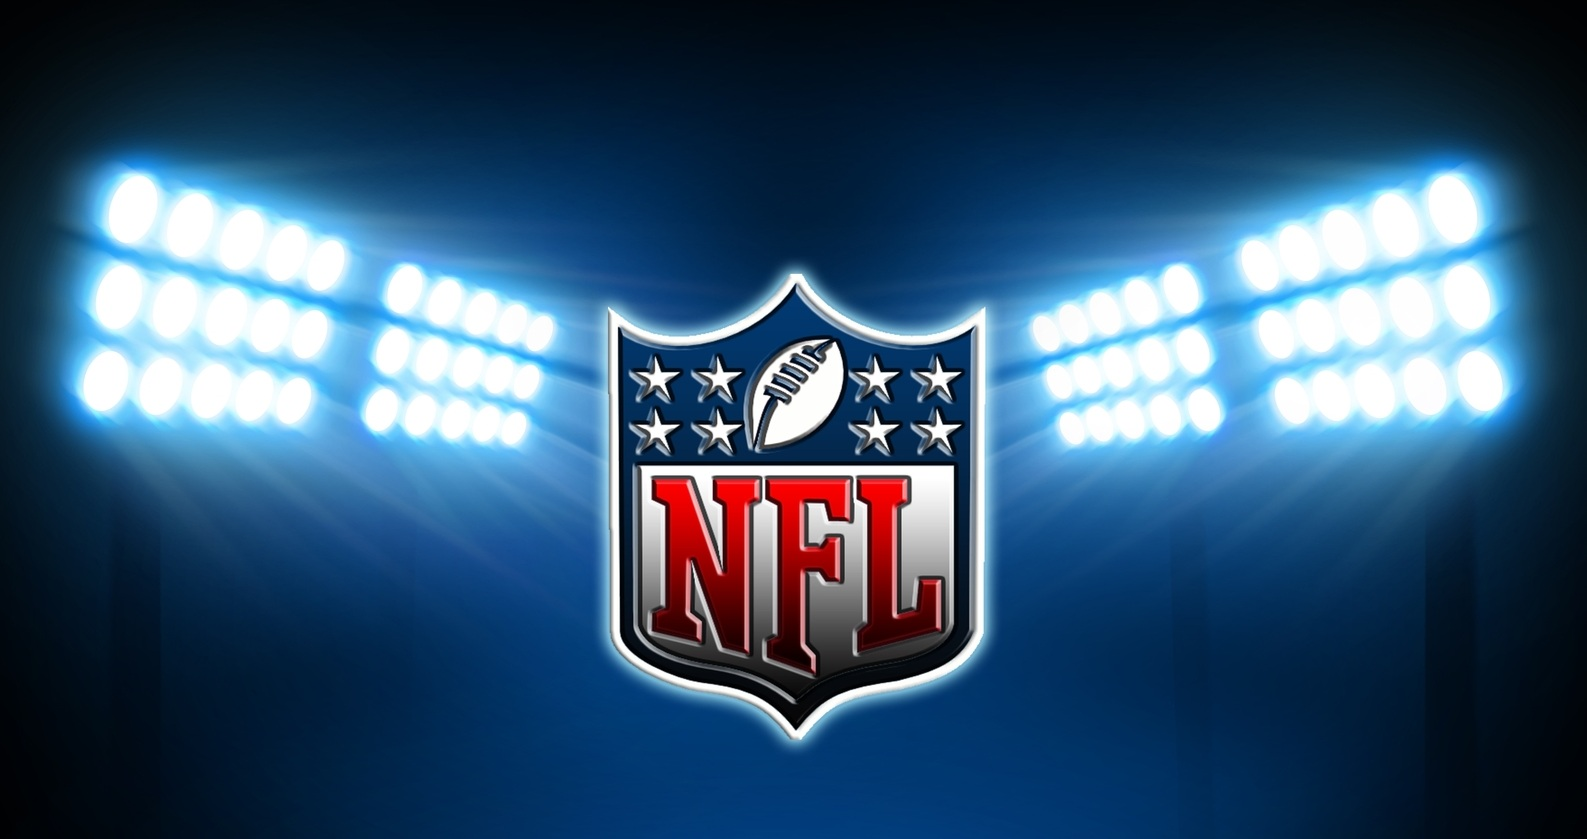 NFL WallpaperNfl Football Field Wallpaper